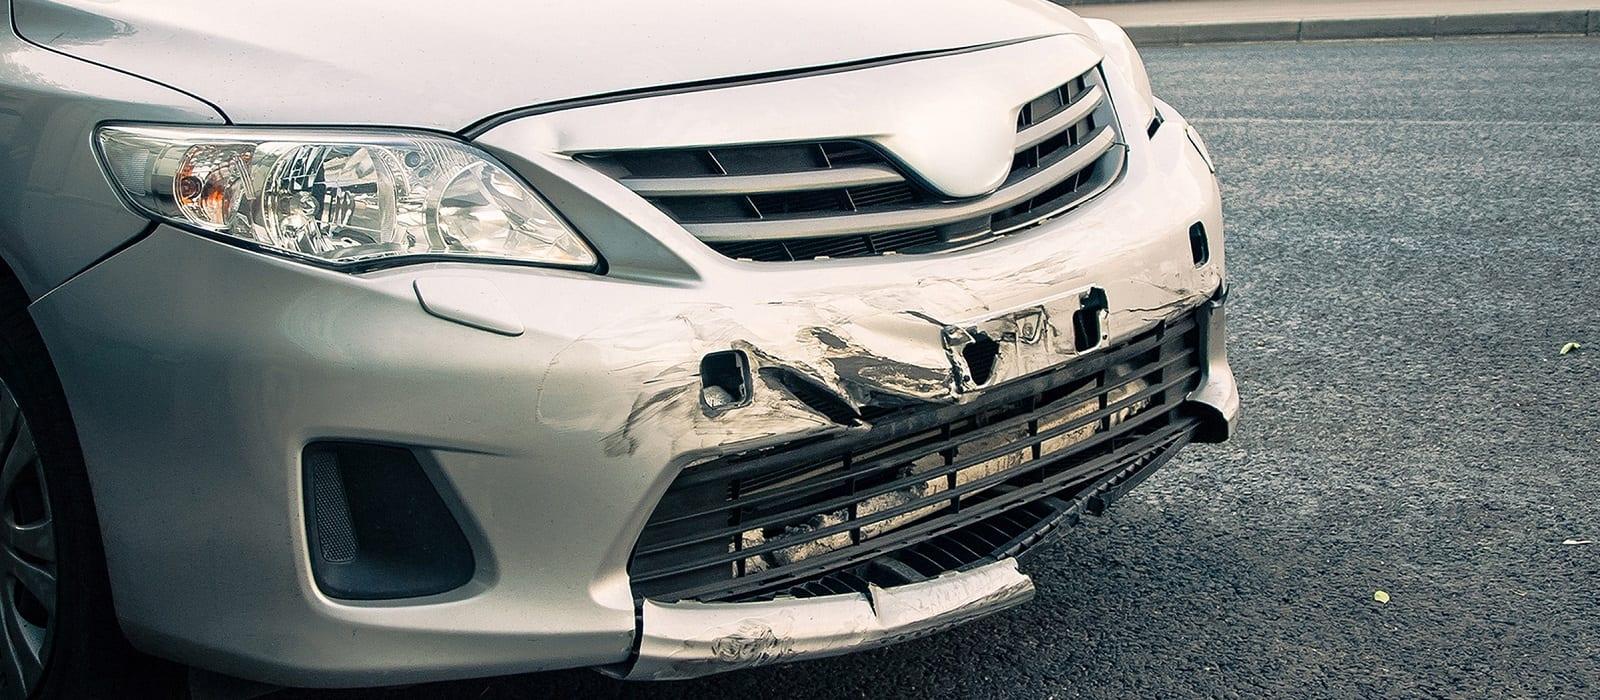 street car accident